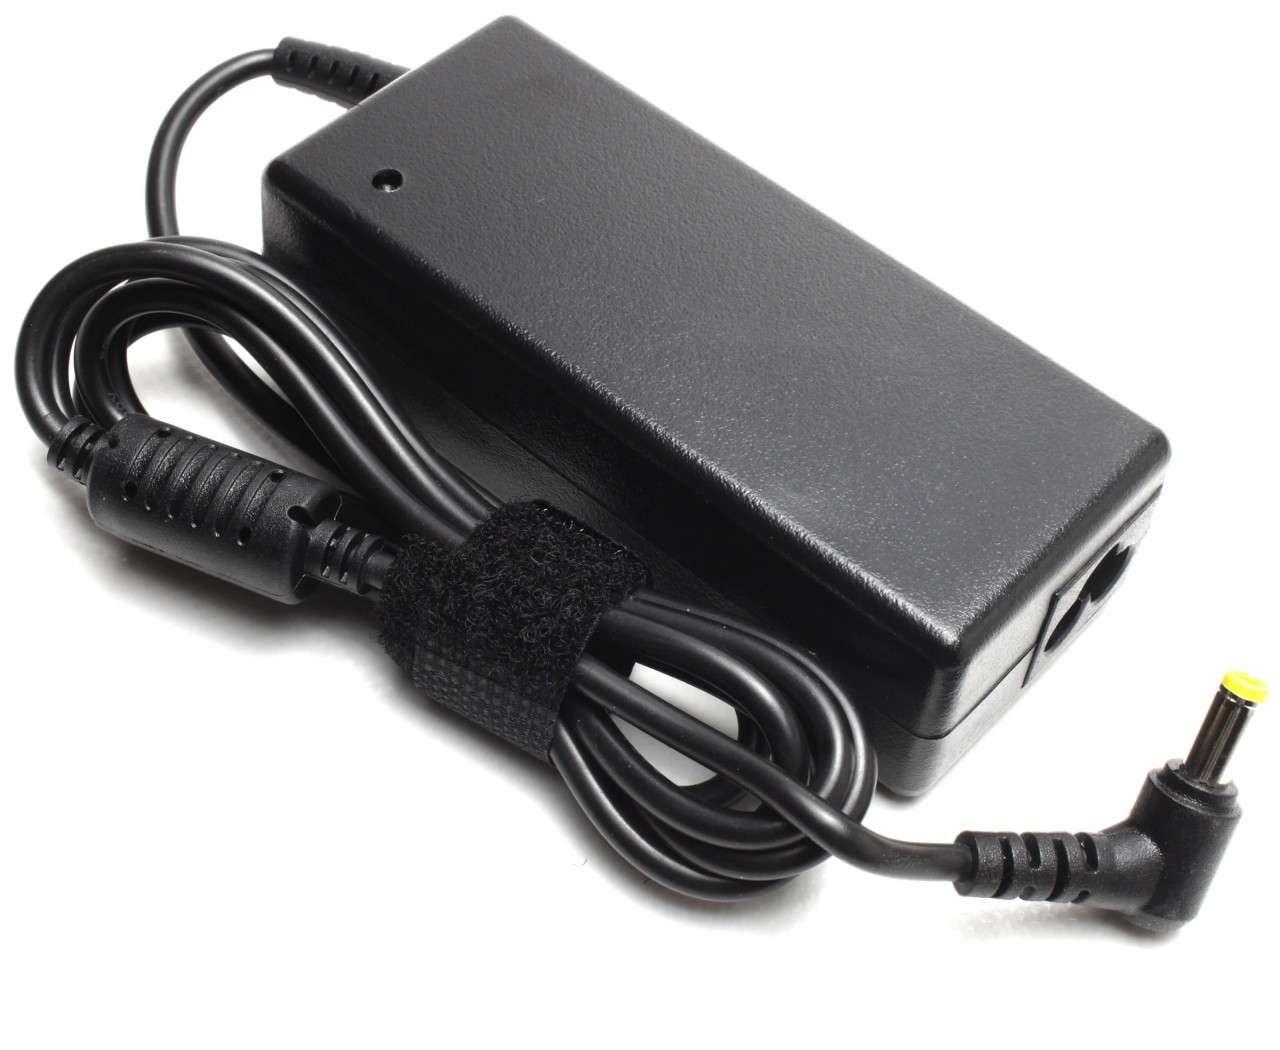 Incarcator Toshiba PA3714E 1AC3 imagine powerlaptop.ro 2021